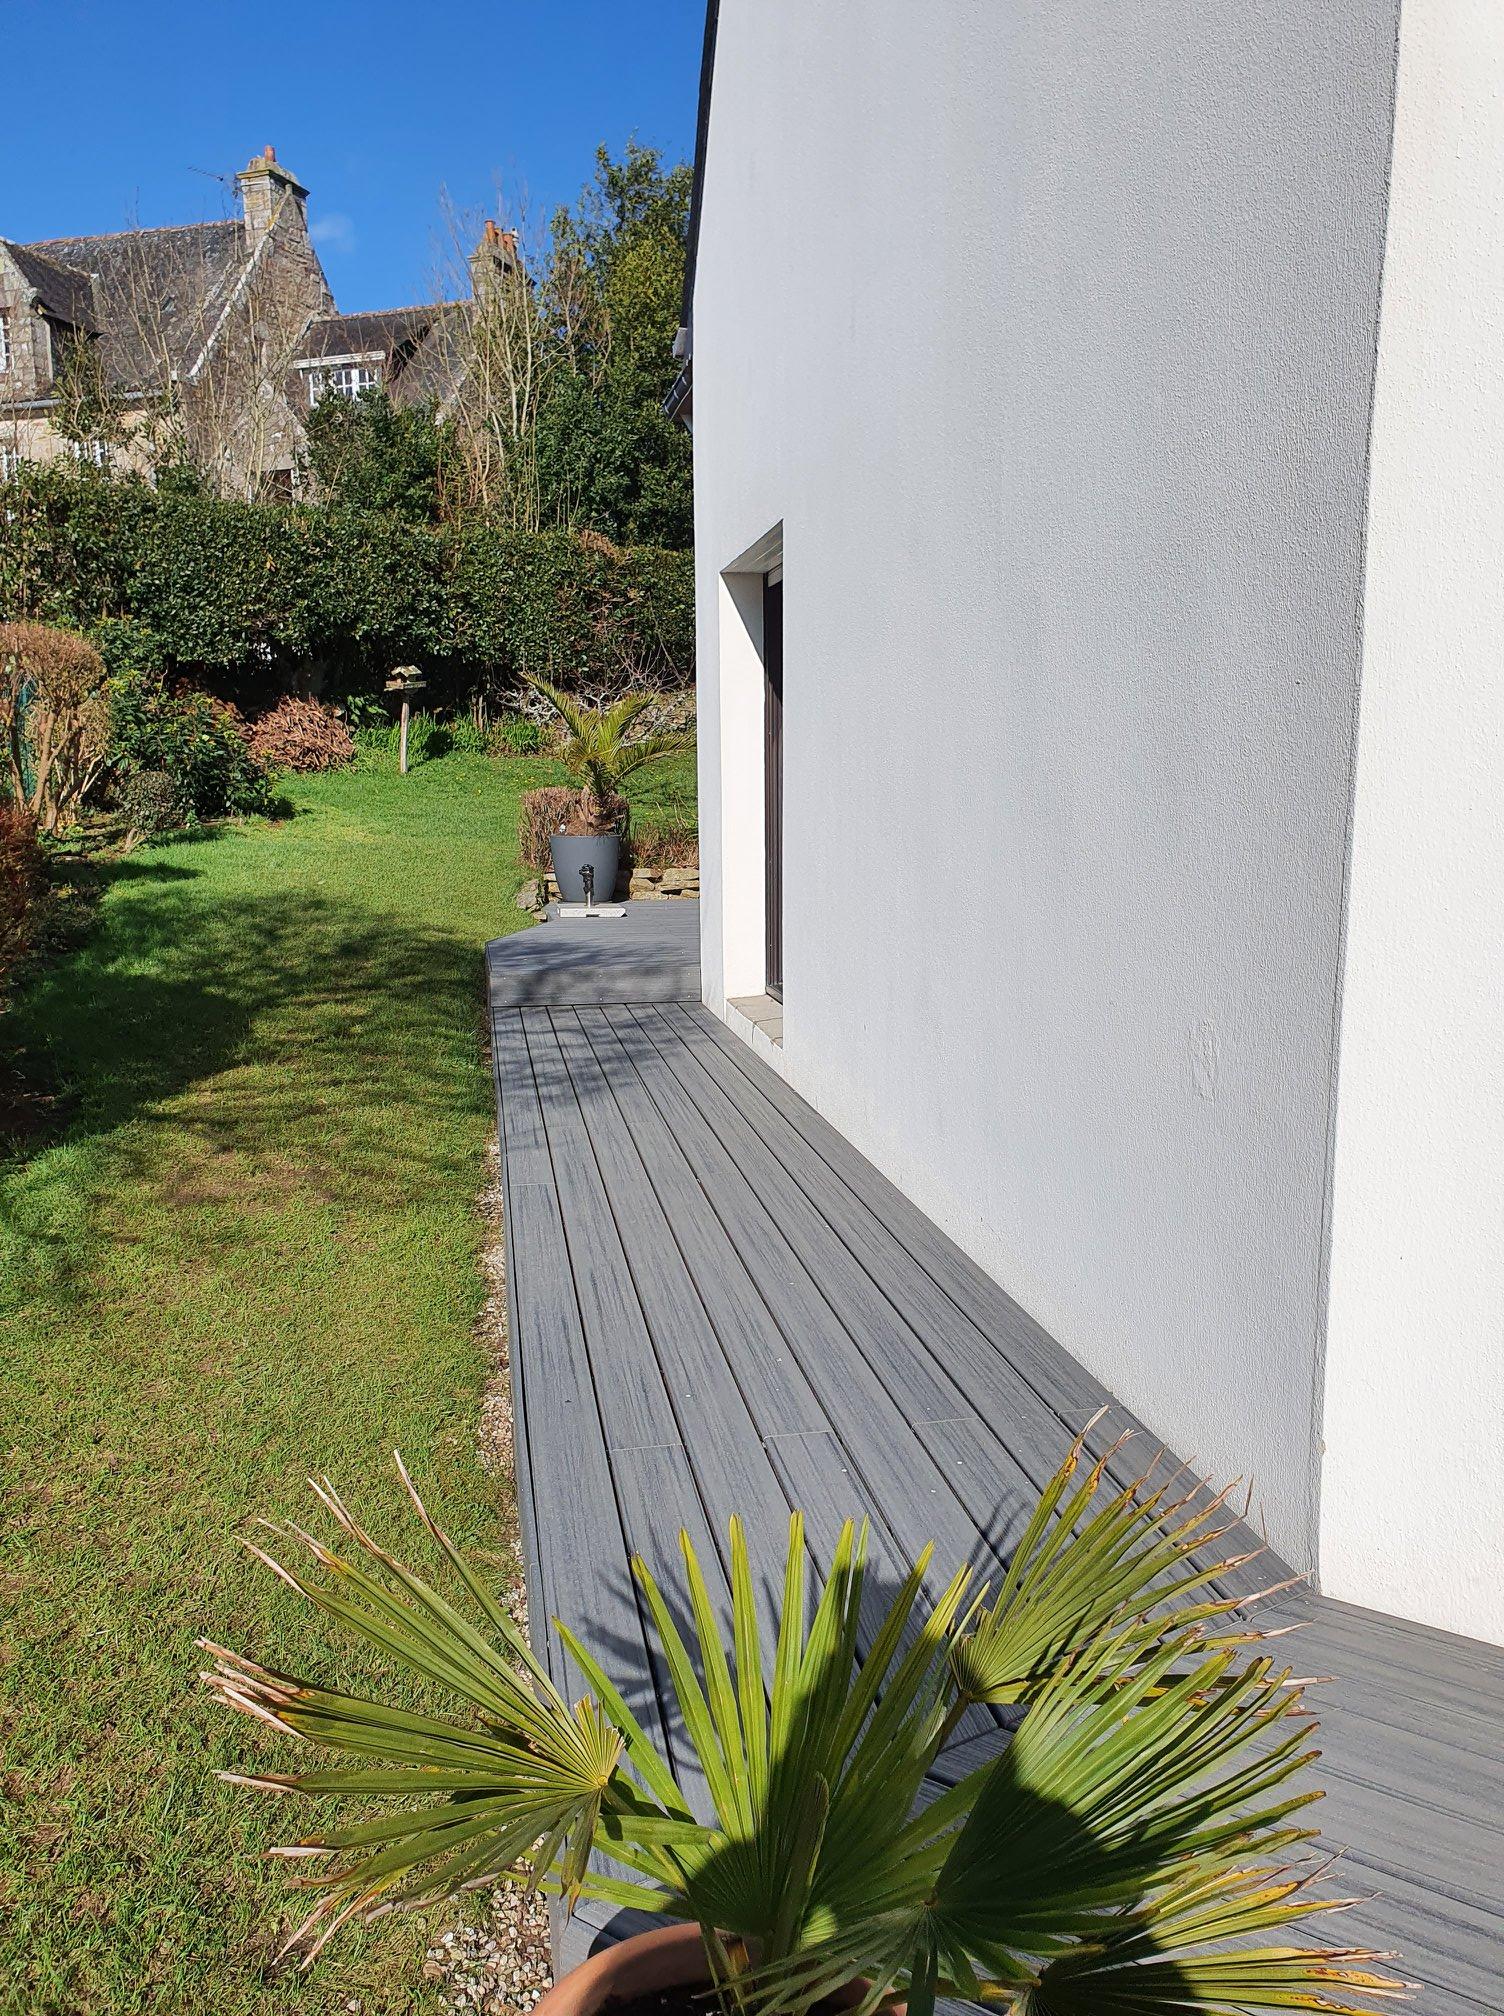 1626335829 596 Realisation dune terrasse en composite TREX de co - Réalisation d'une terrasse en composite TREX de co...